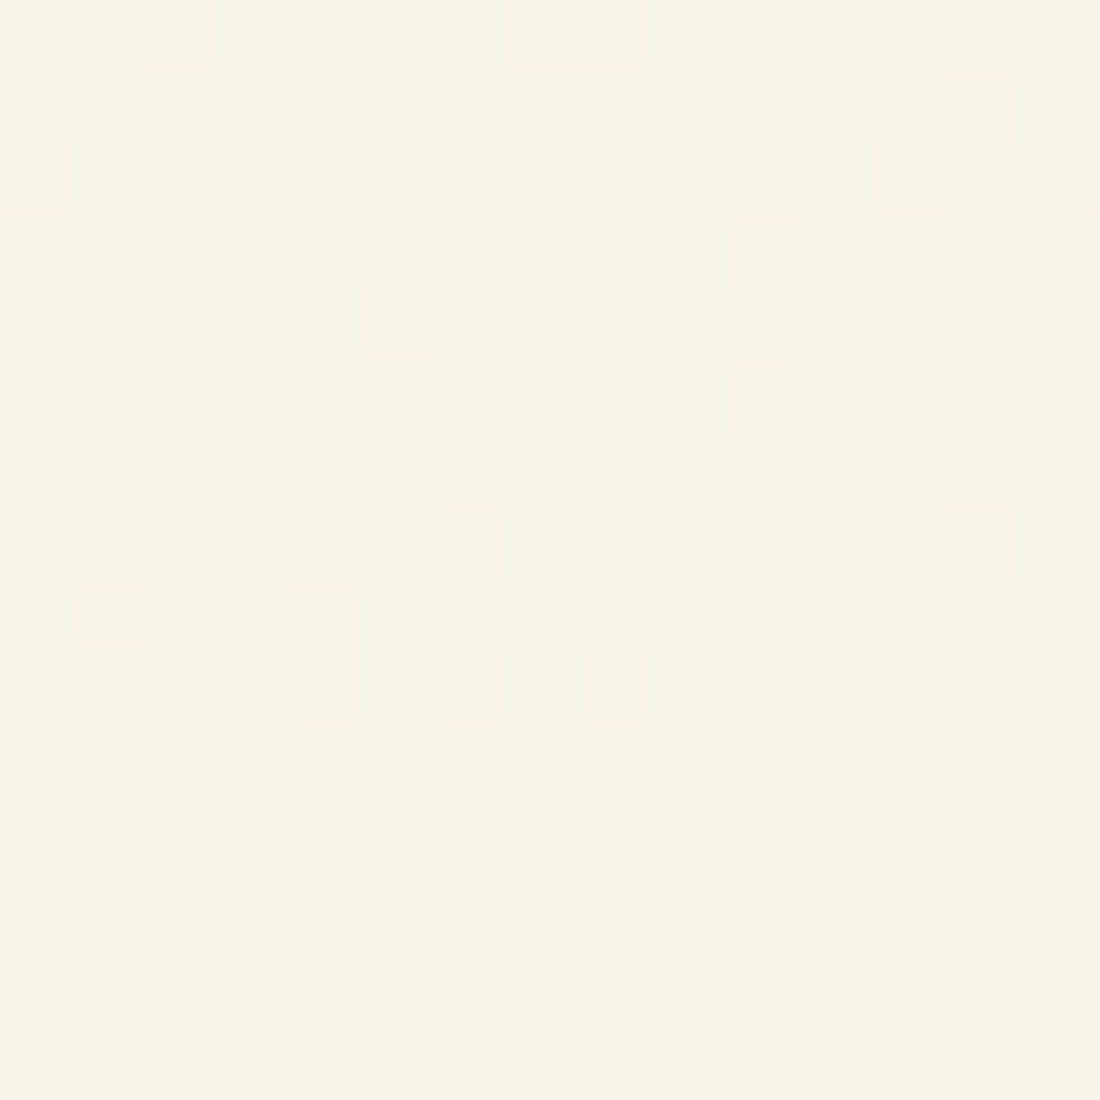 Piso Incopisos Bege 50,5 x 50,5 Brilhante Ref 80011 Extra